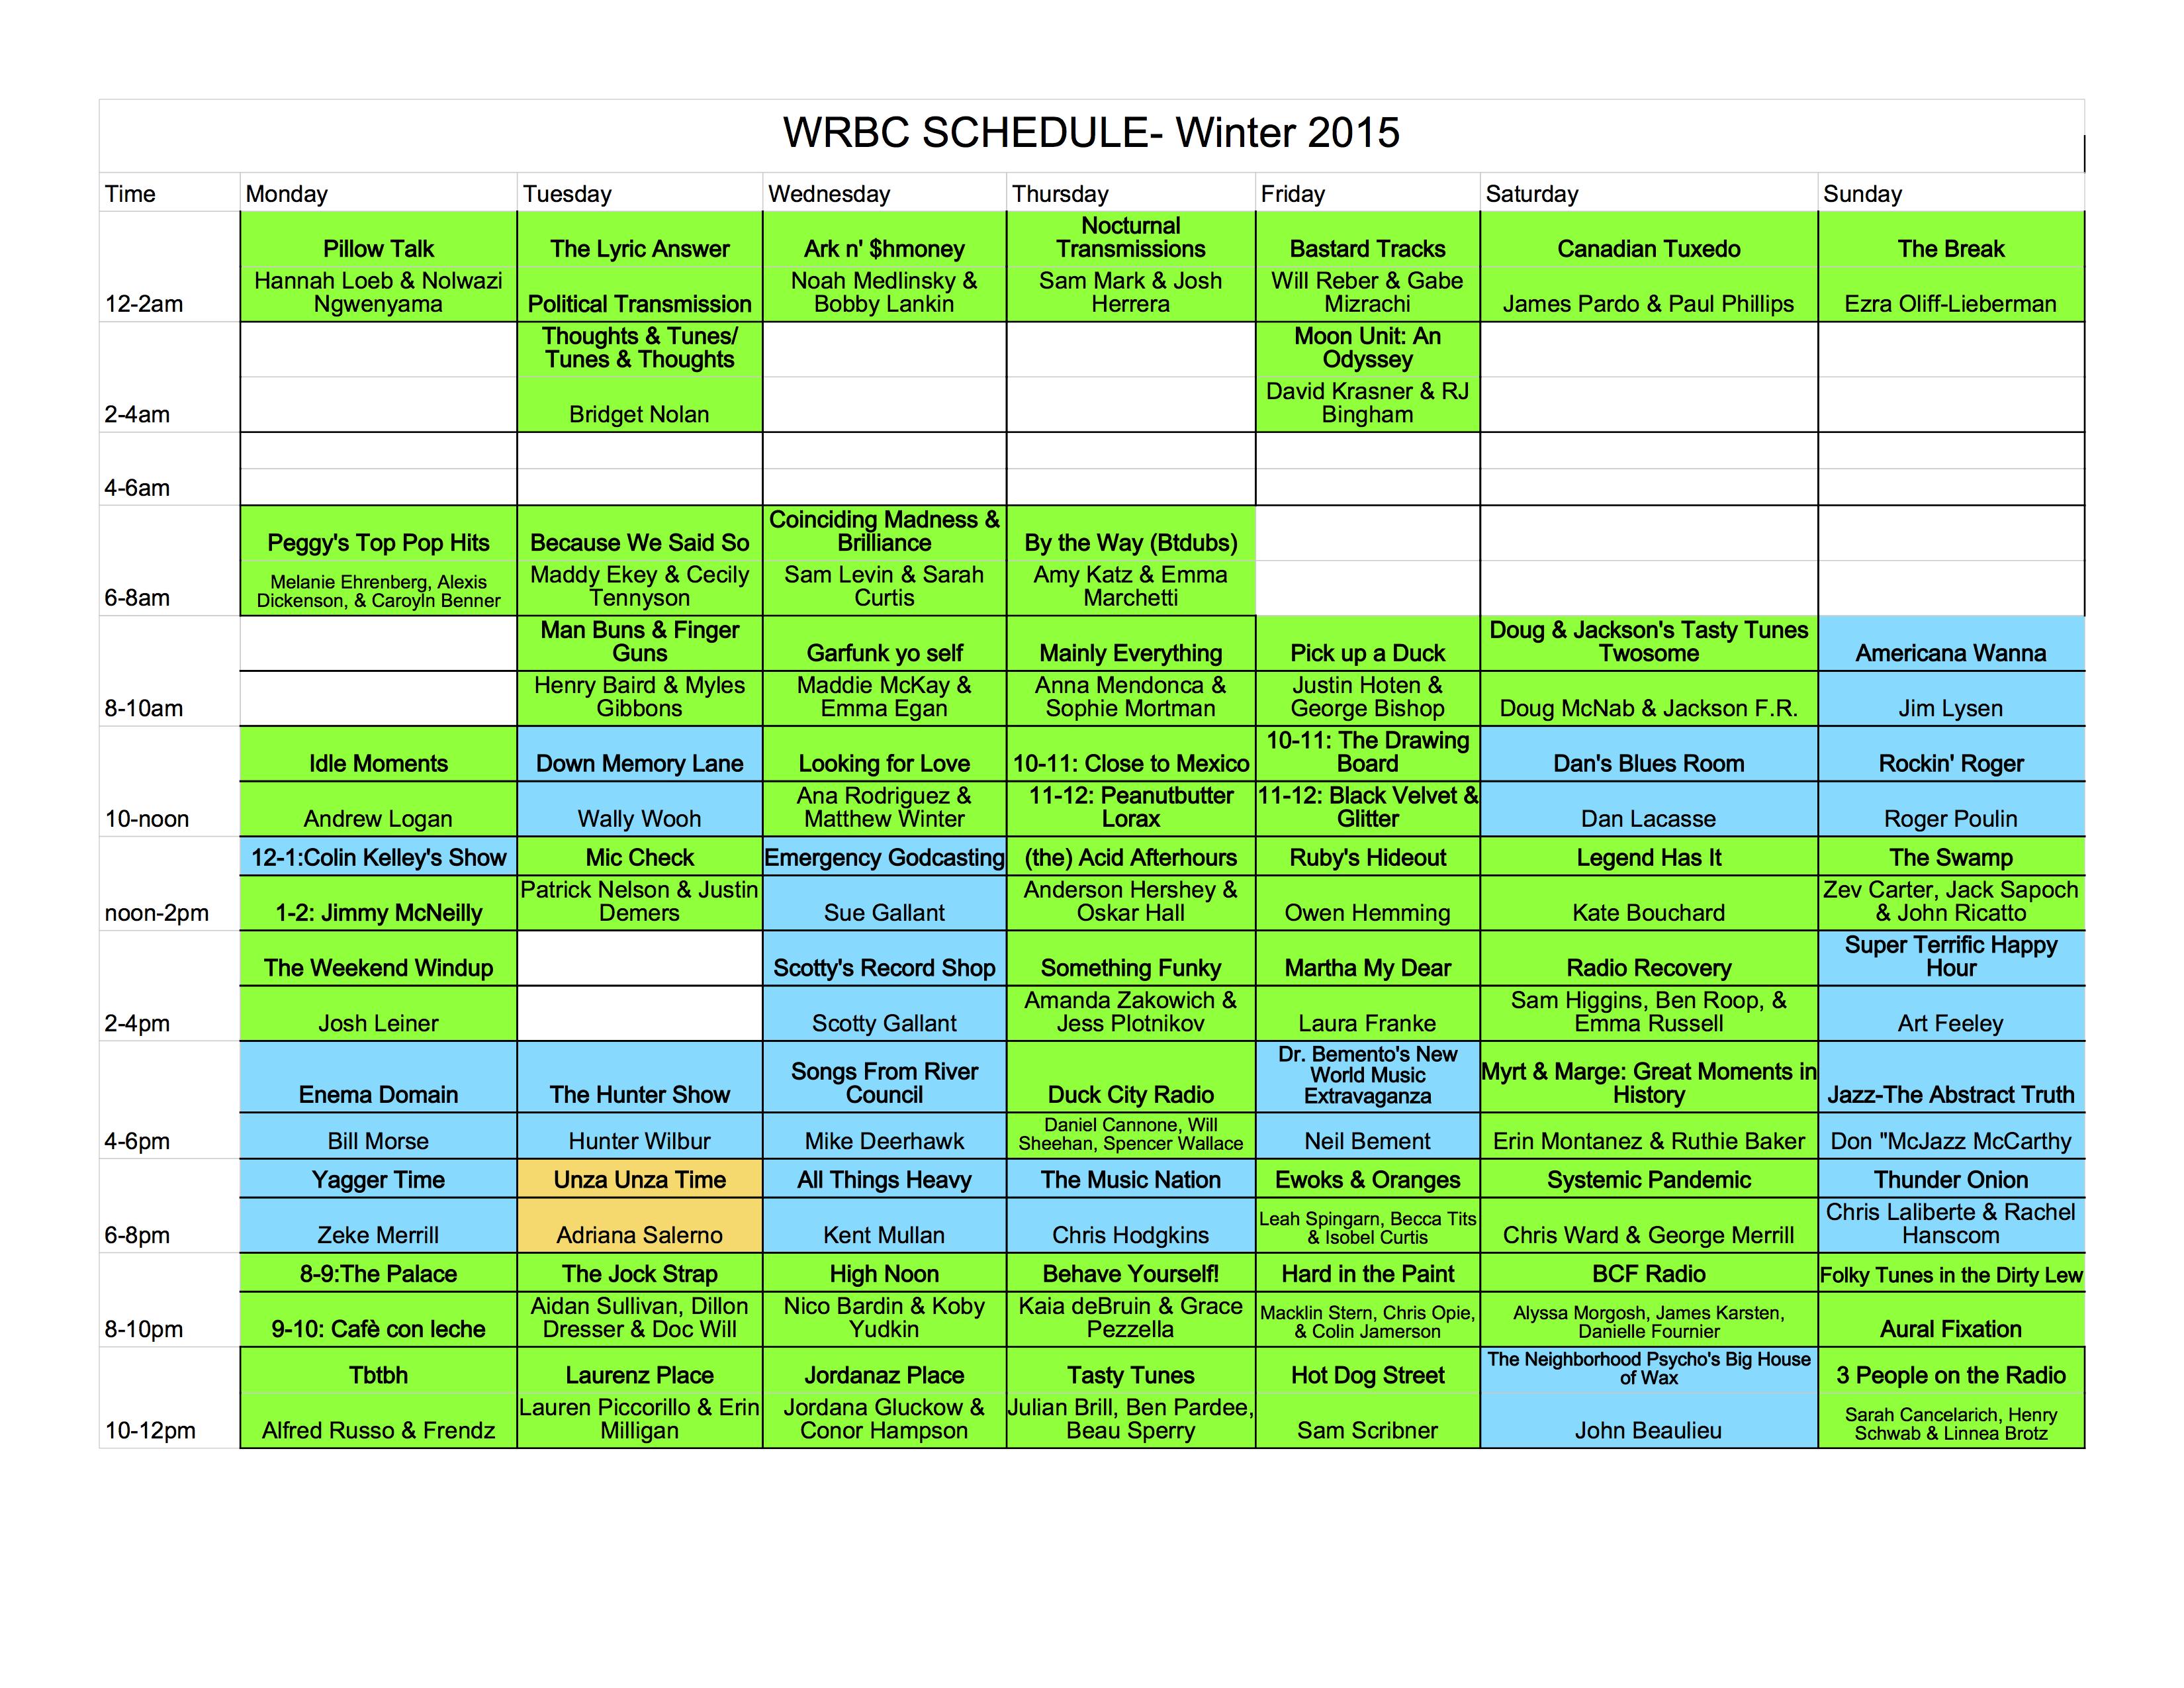 WRBC schedule 2015 img